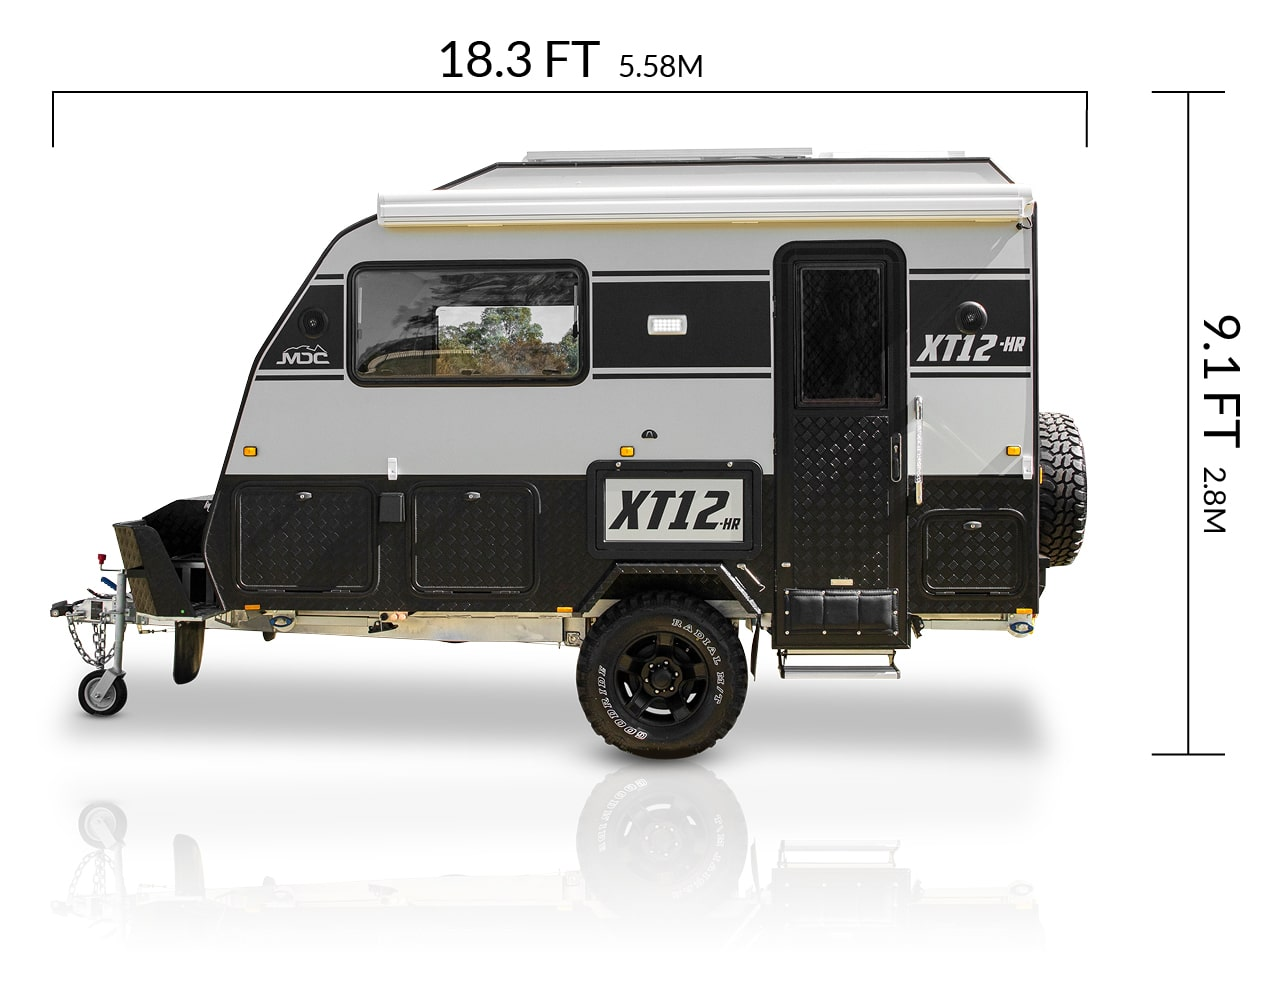 MDC USA XT12HR overlanding caravan dimensions